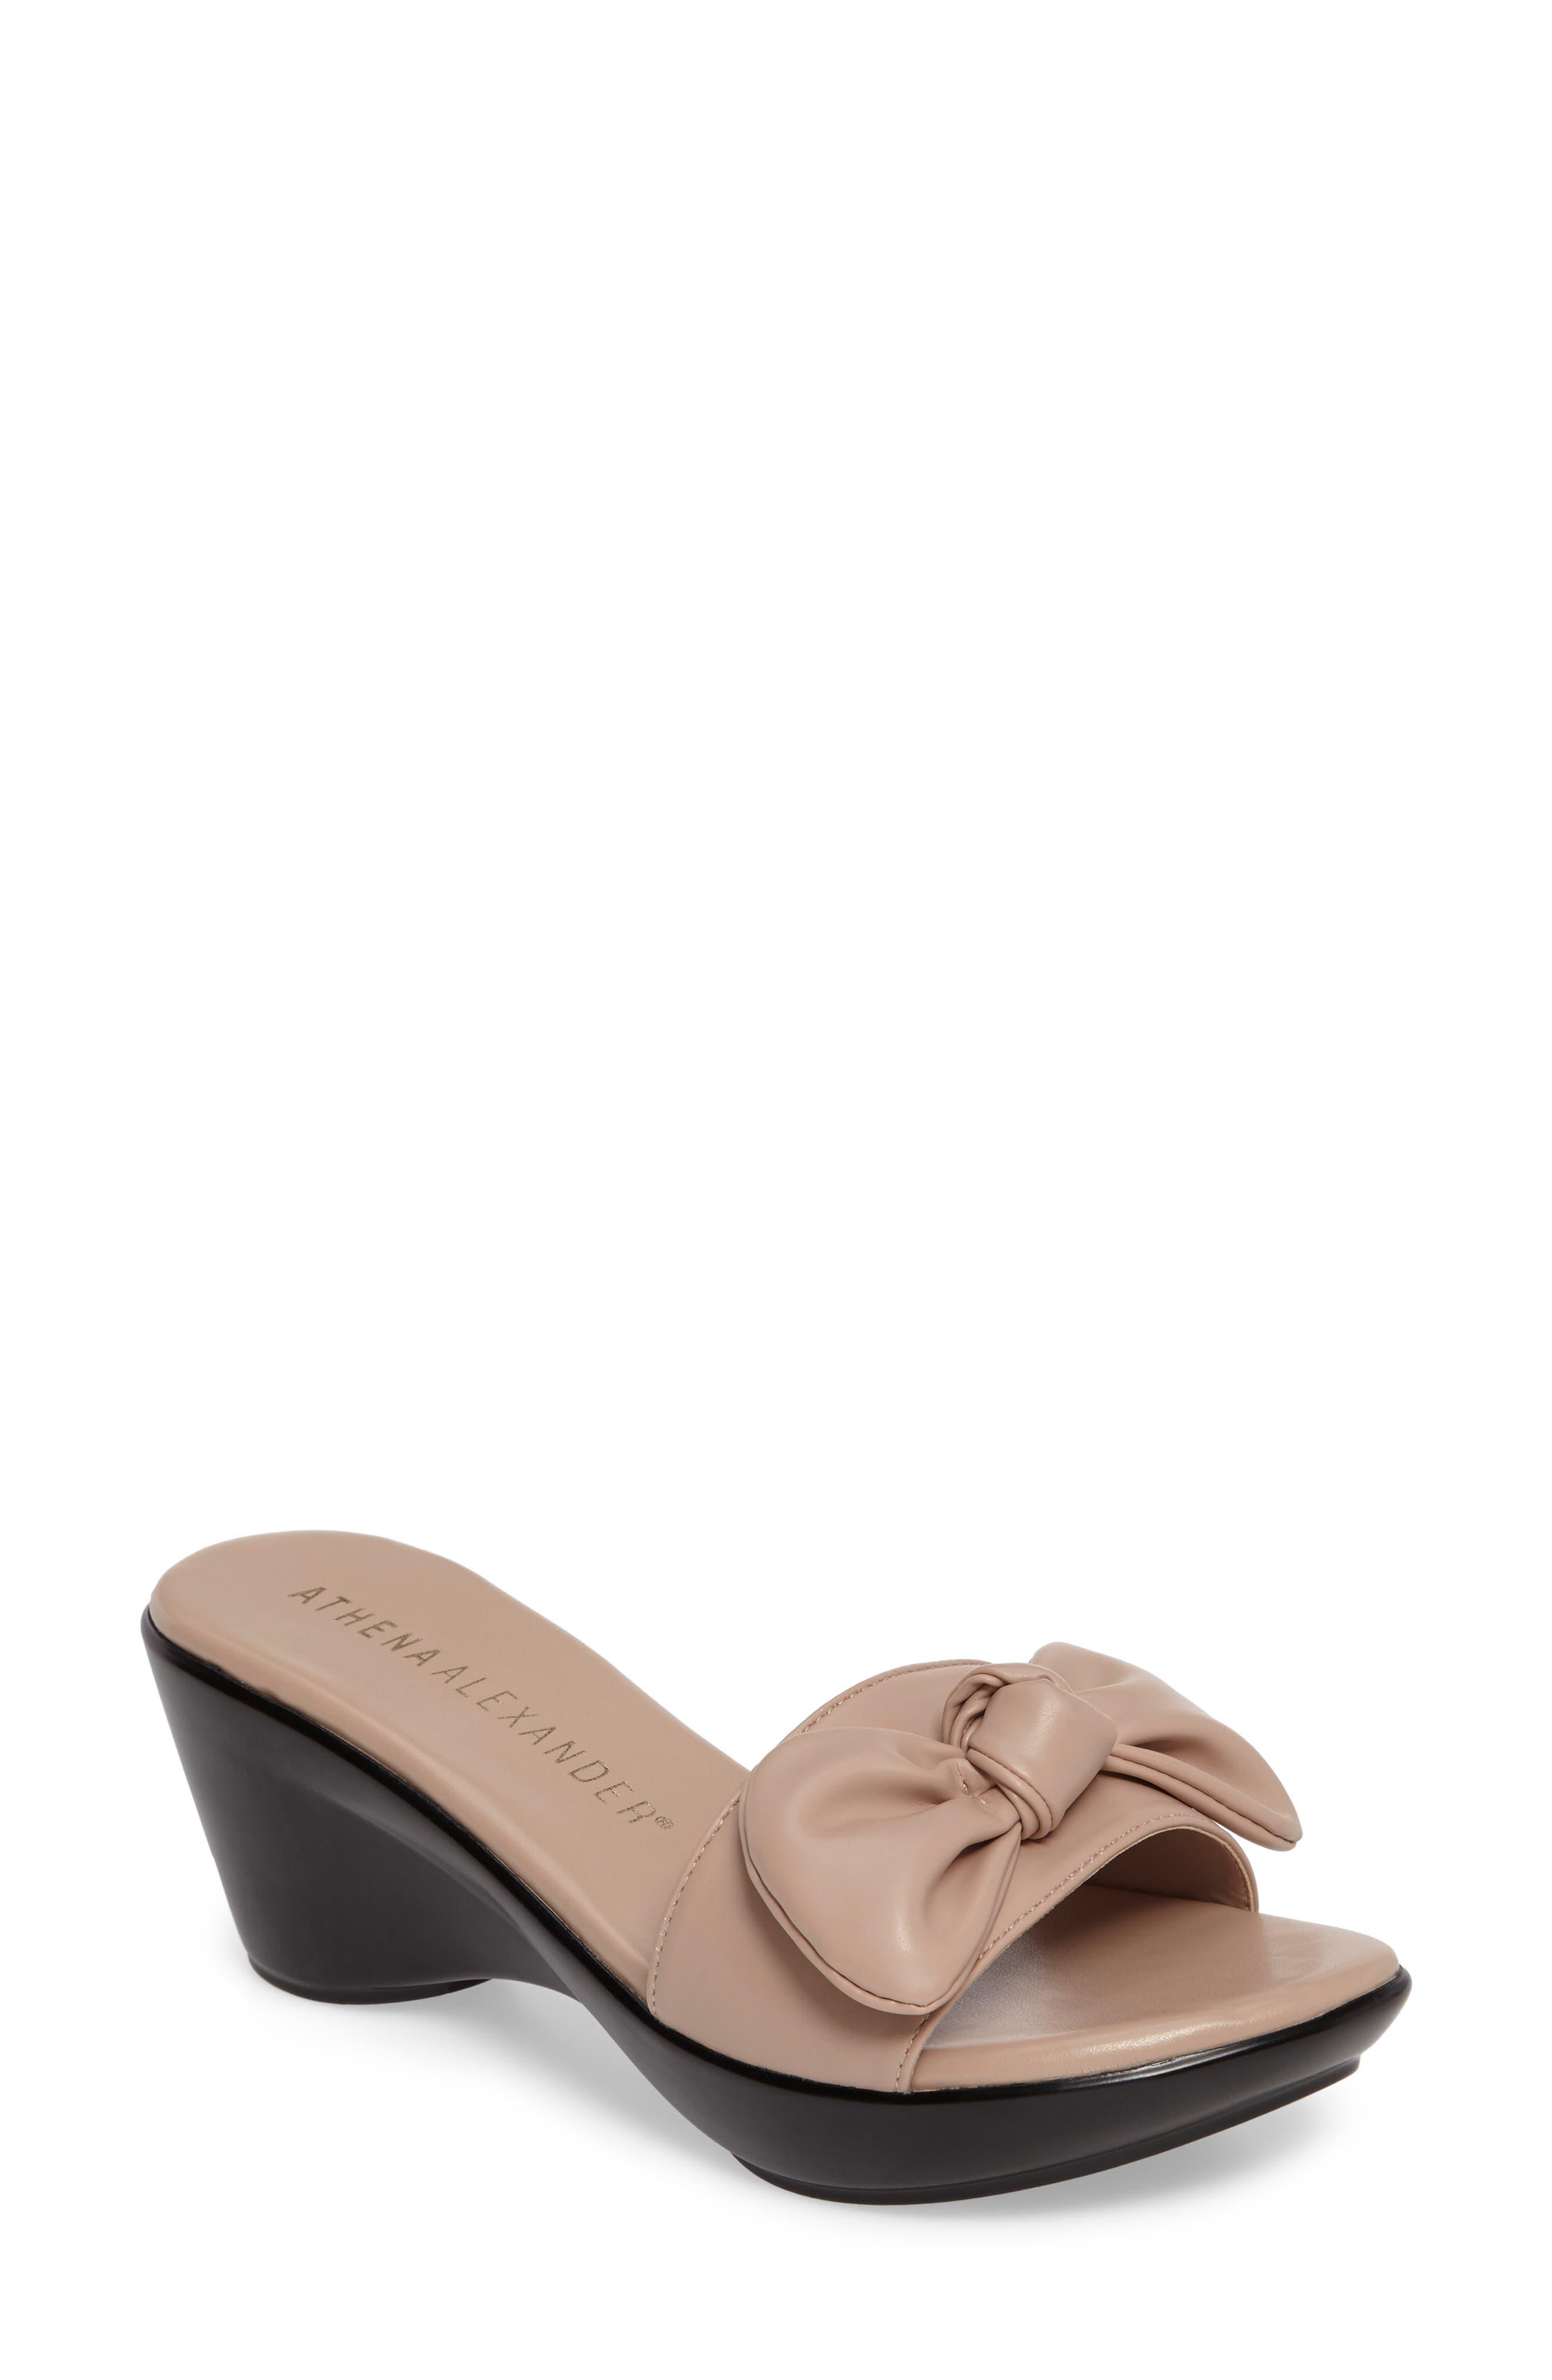 Athena Alexander Pattye Knotted Slide Sandal (Women)